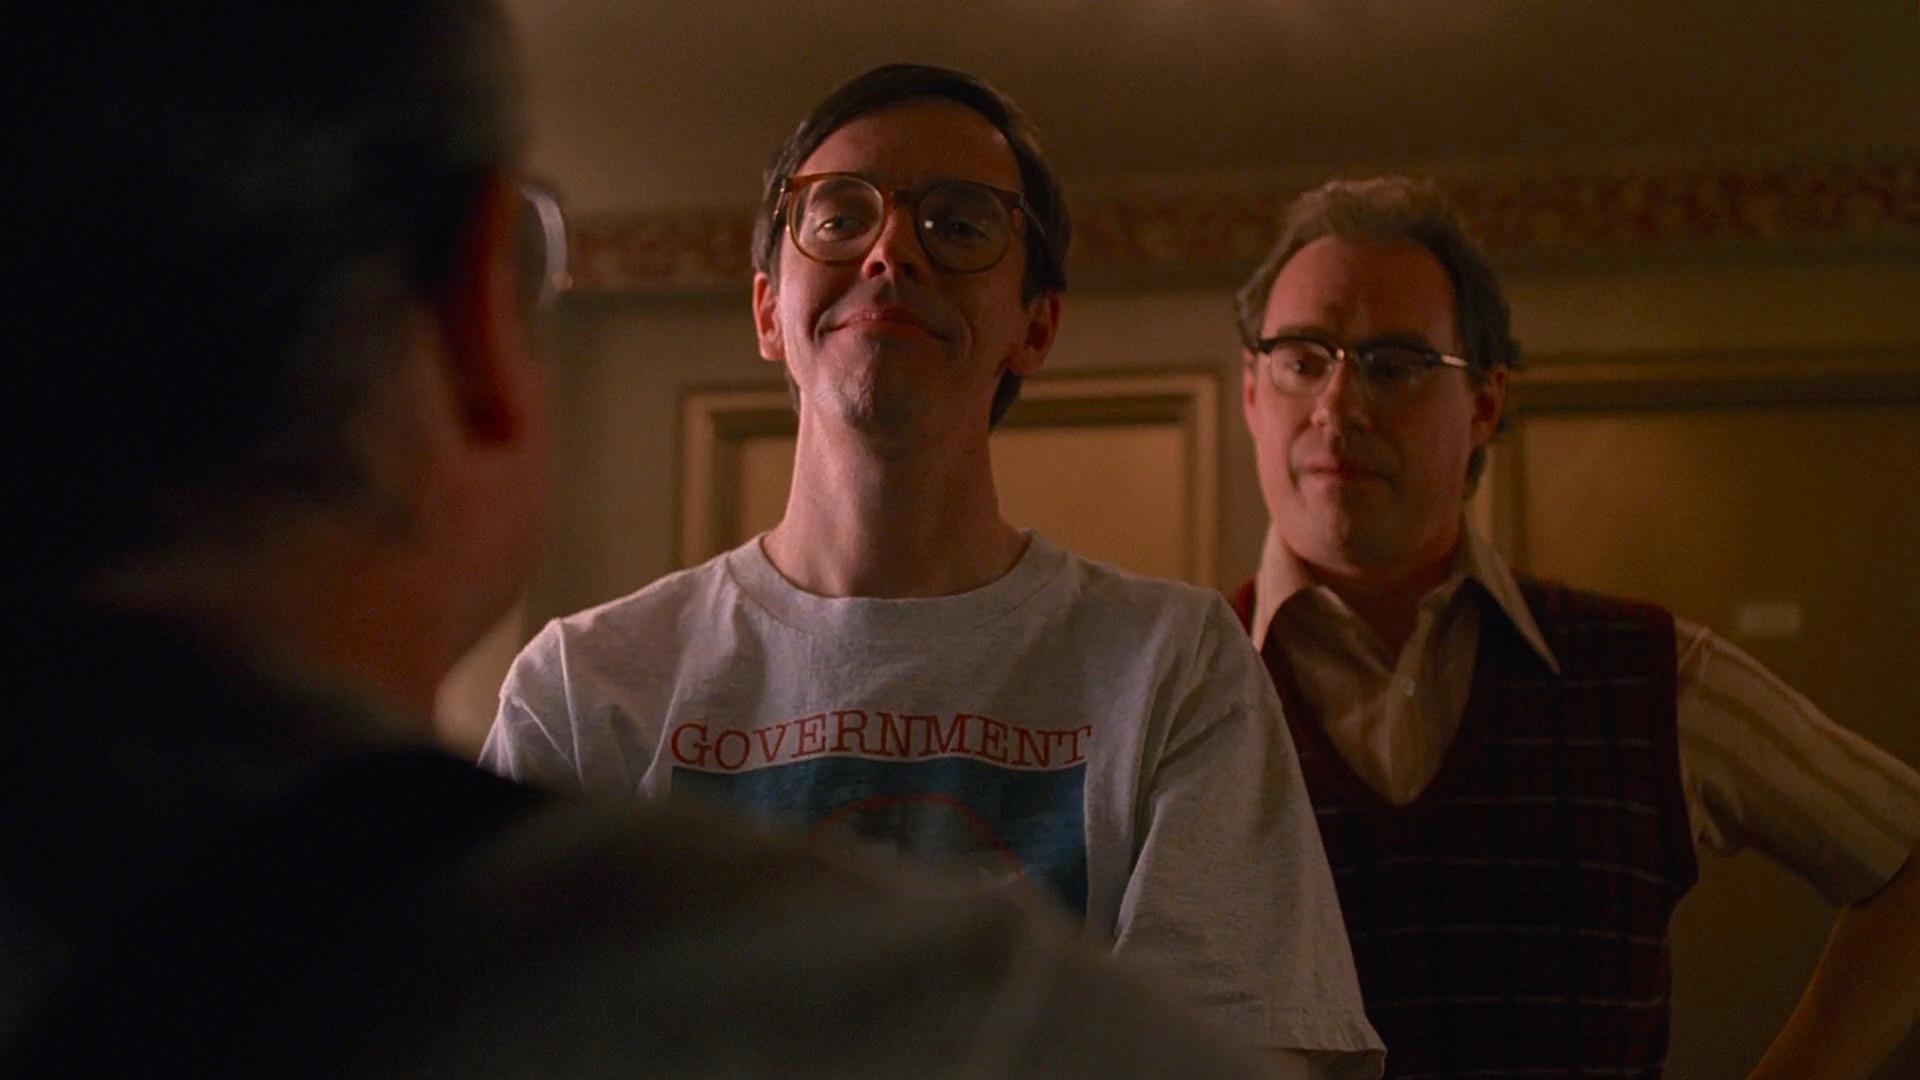 John Billingsley and Jim Fyfe in The X Files (1993)